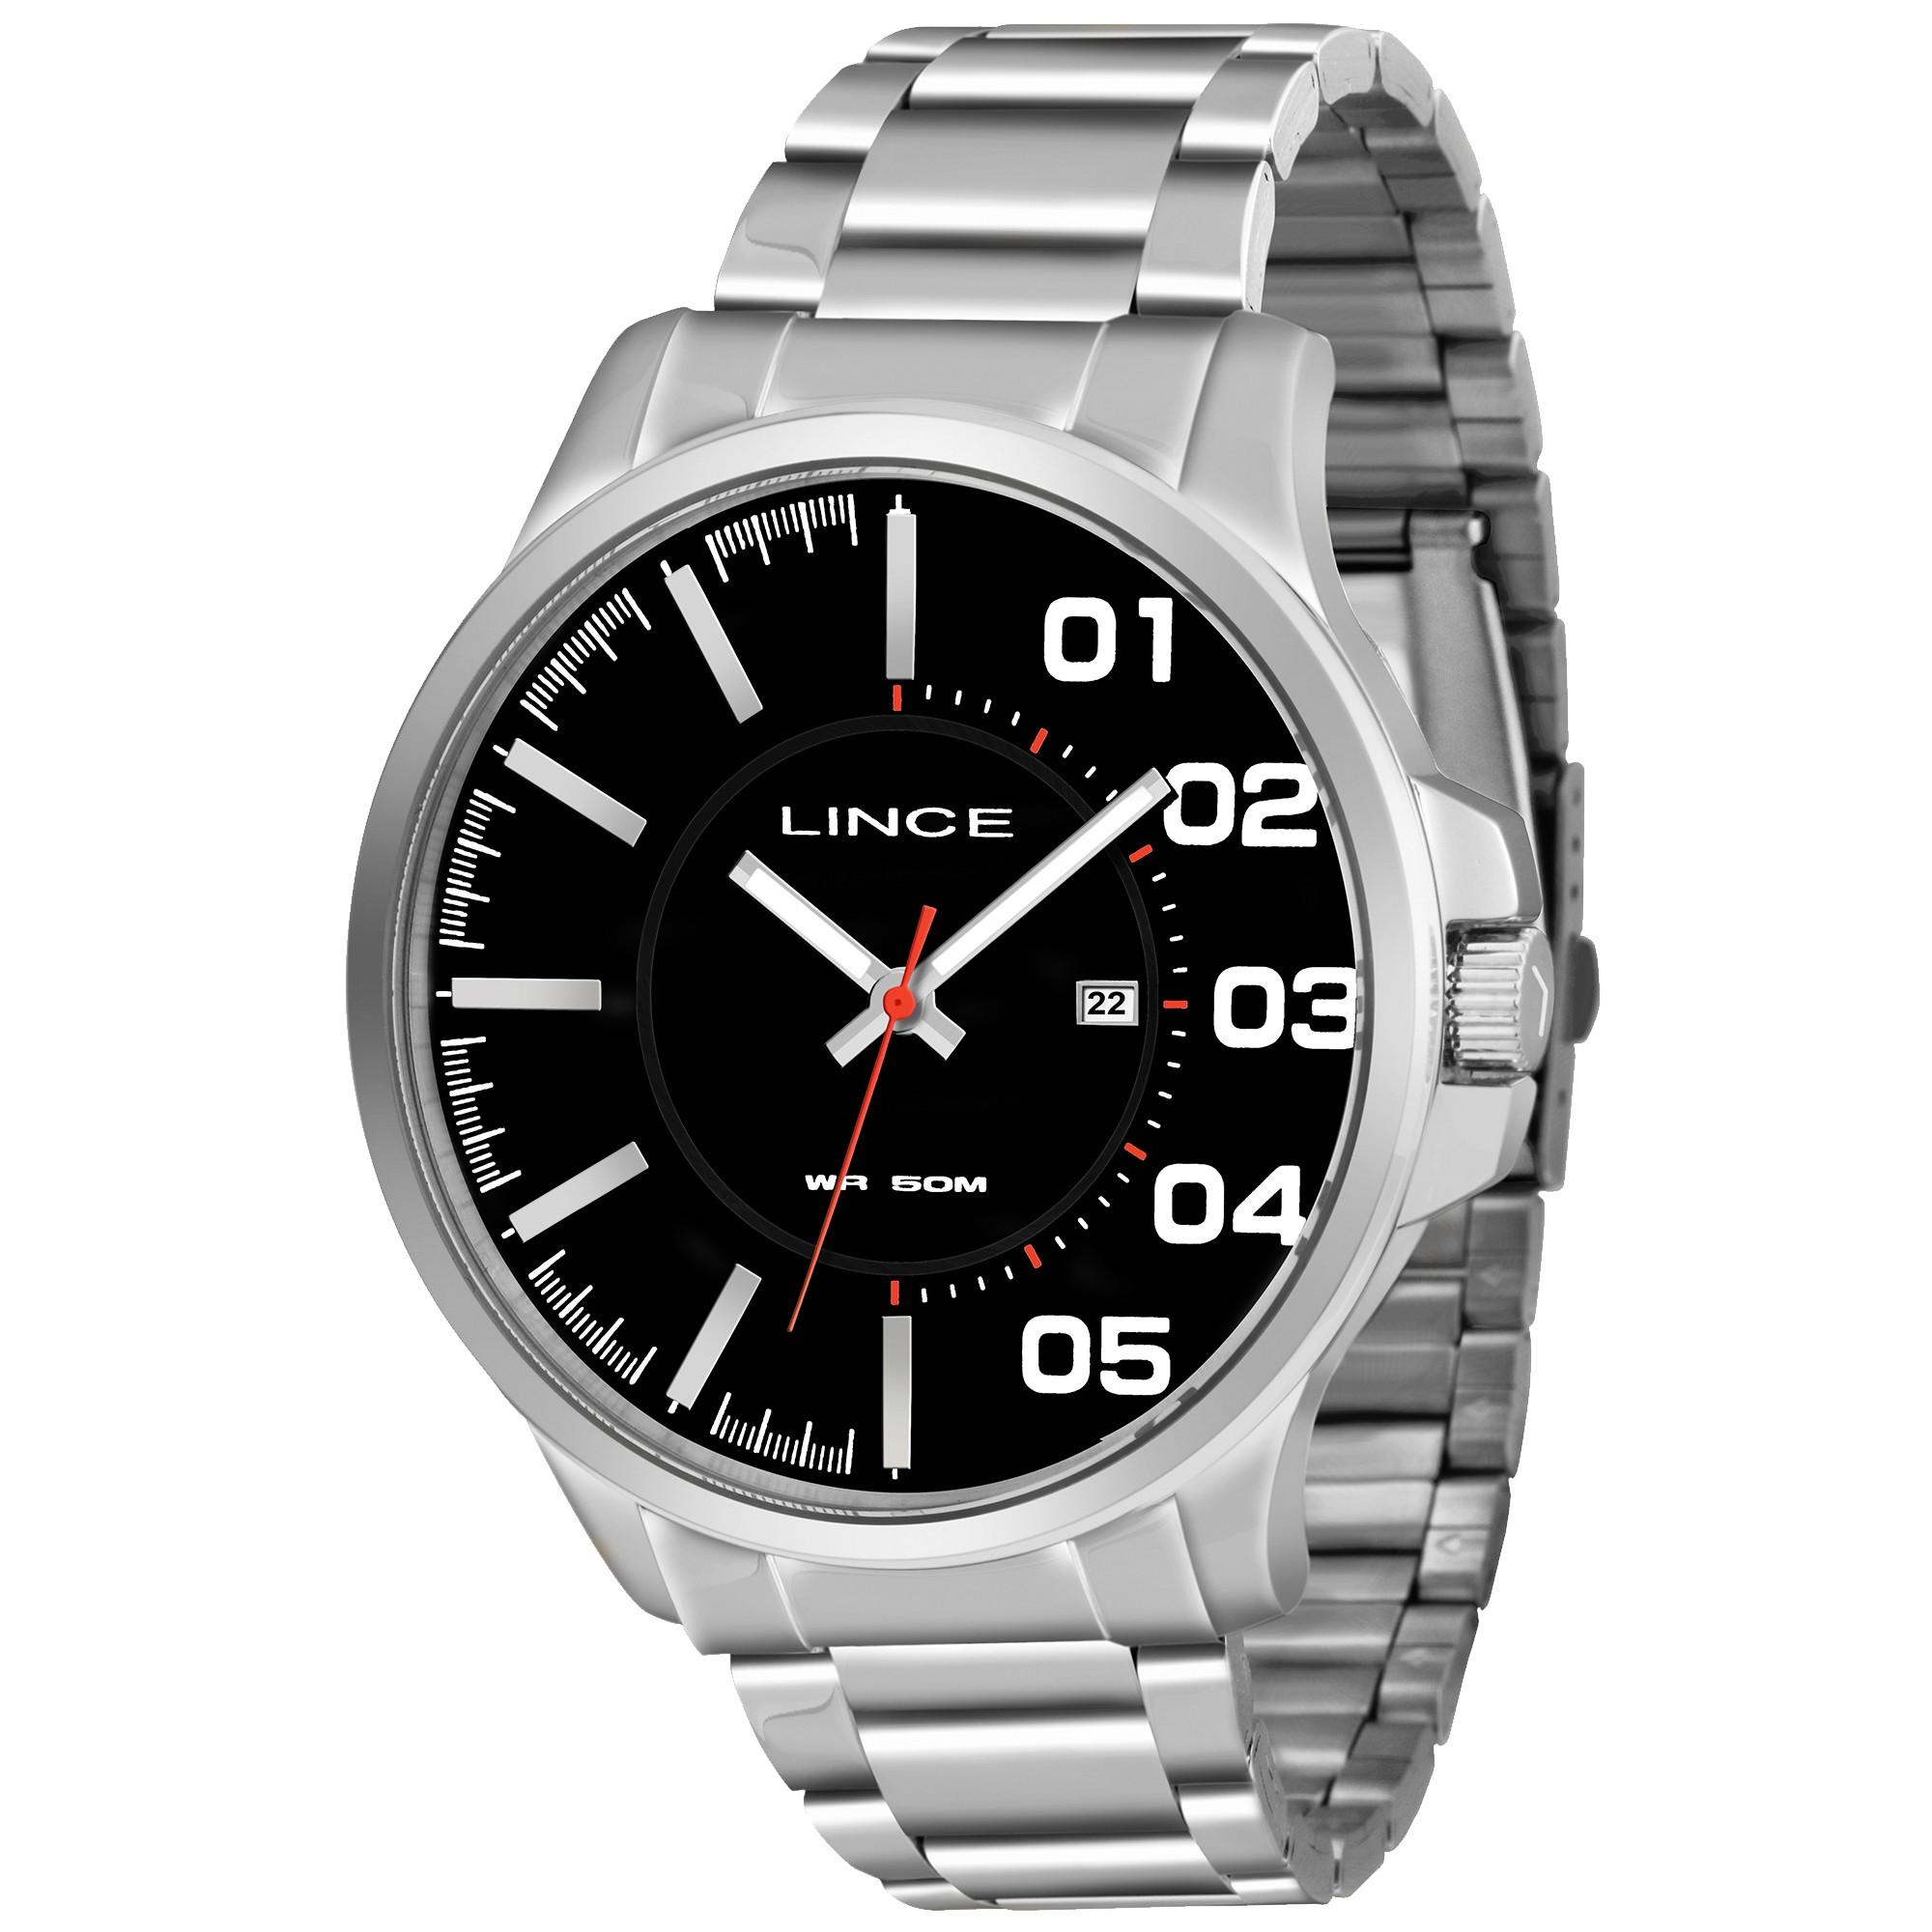 Relógio Lince Masculino - MRMH020S  - Dumont Online - Joias e Relógios